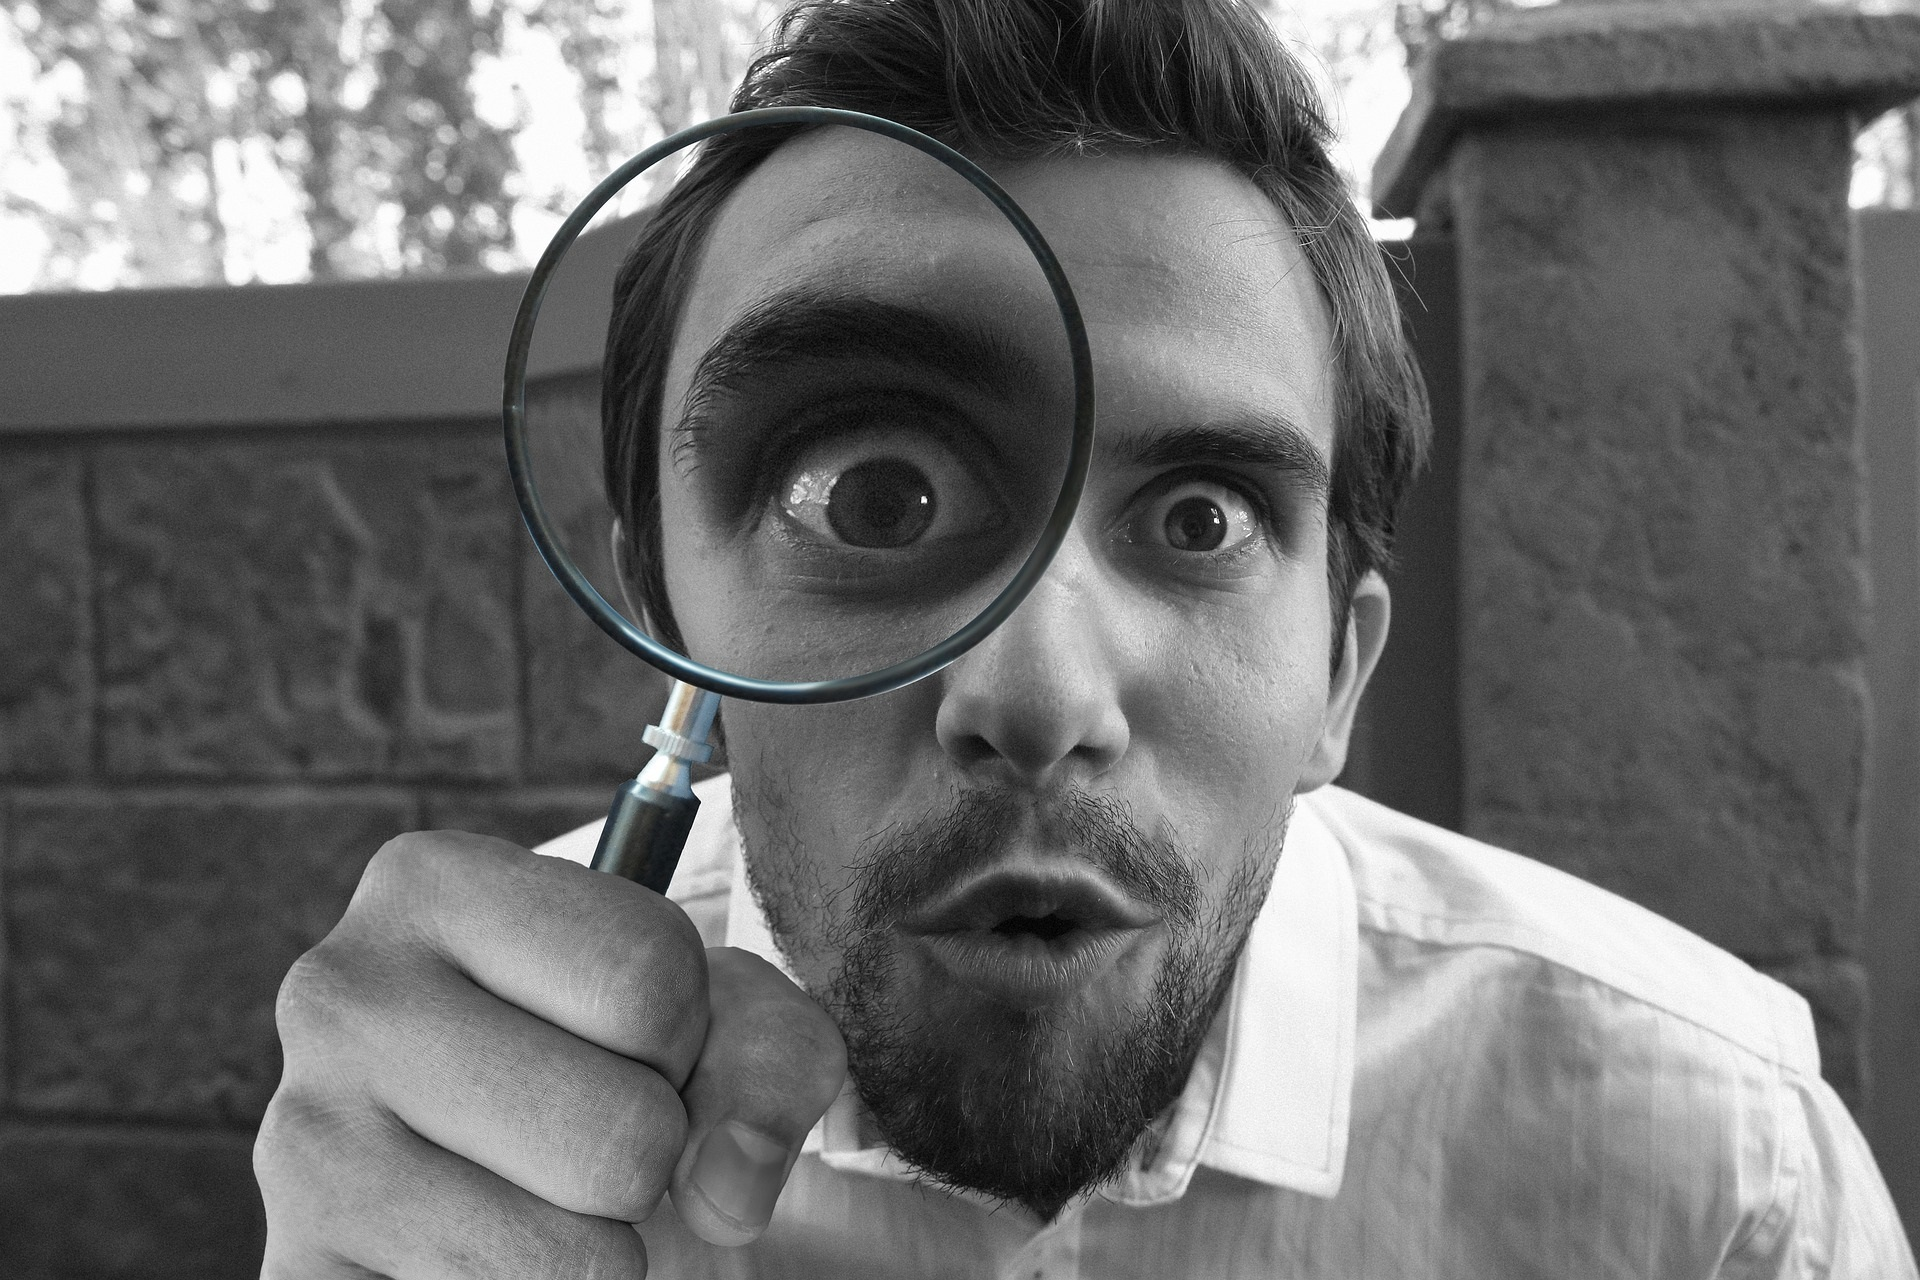 Mies katsoo suurennuslasin läpi. Man looks through a magnifying glass.